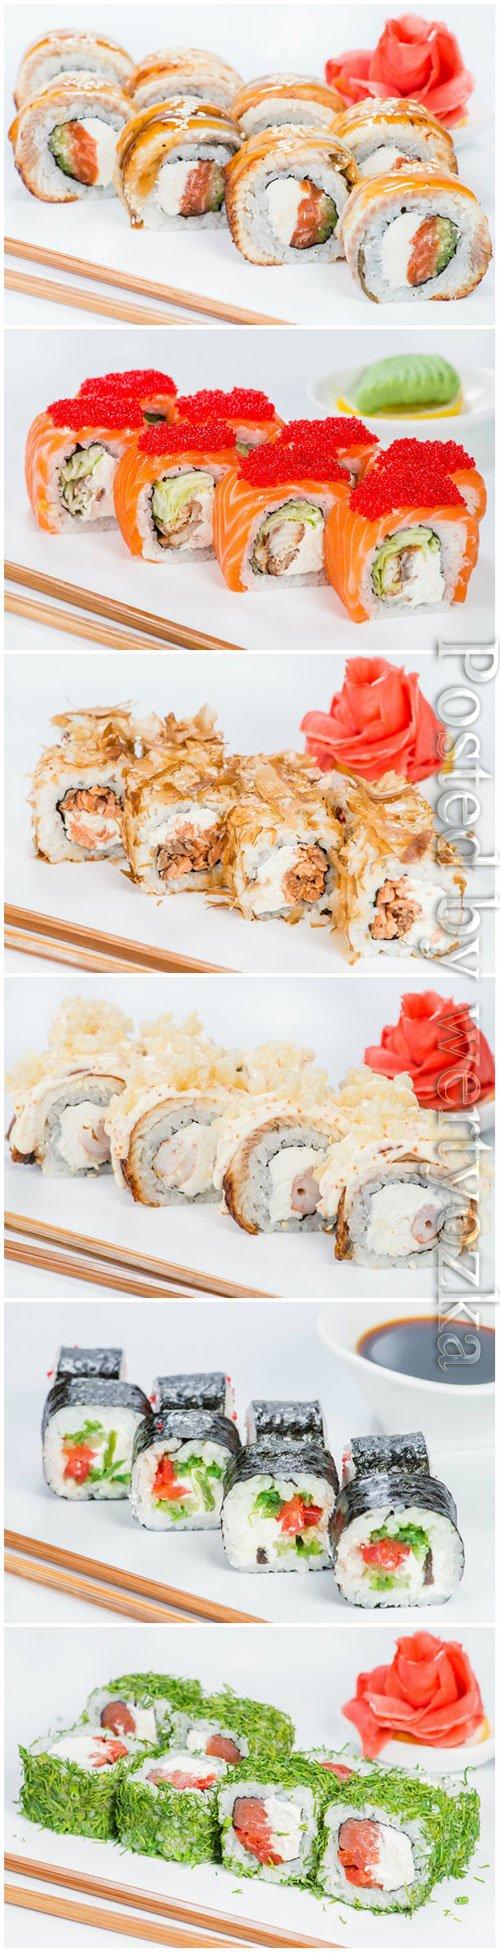 Tasty Japanese cuisine sushi rolls